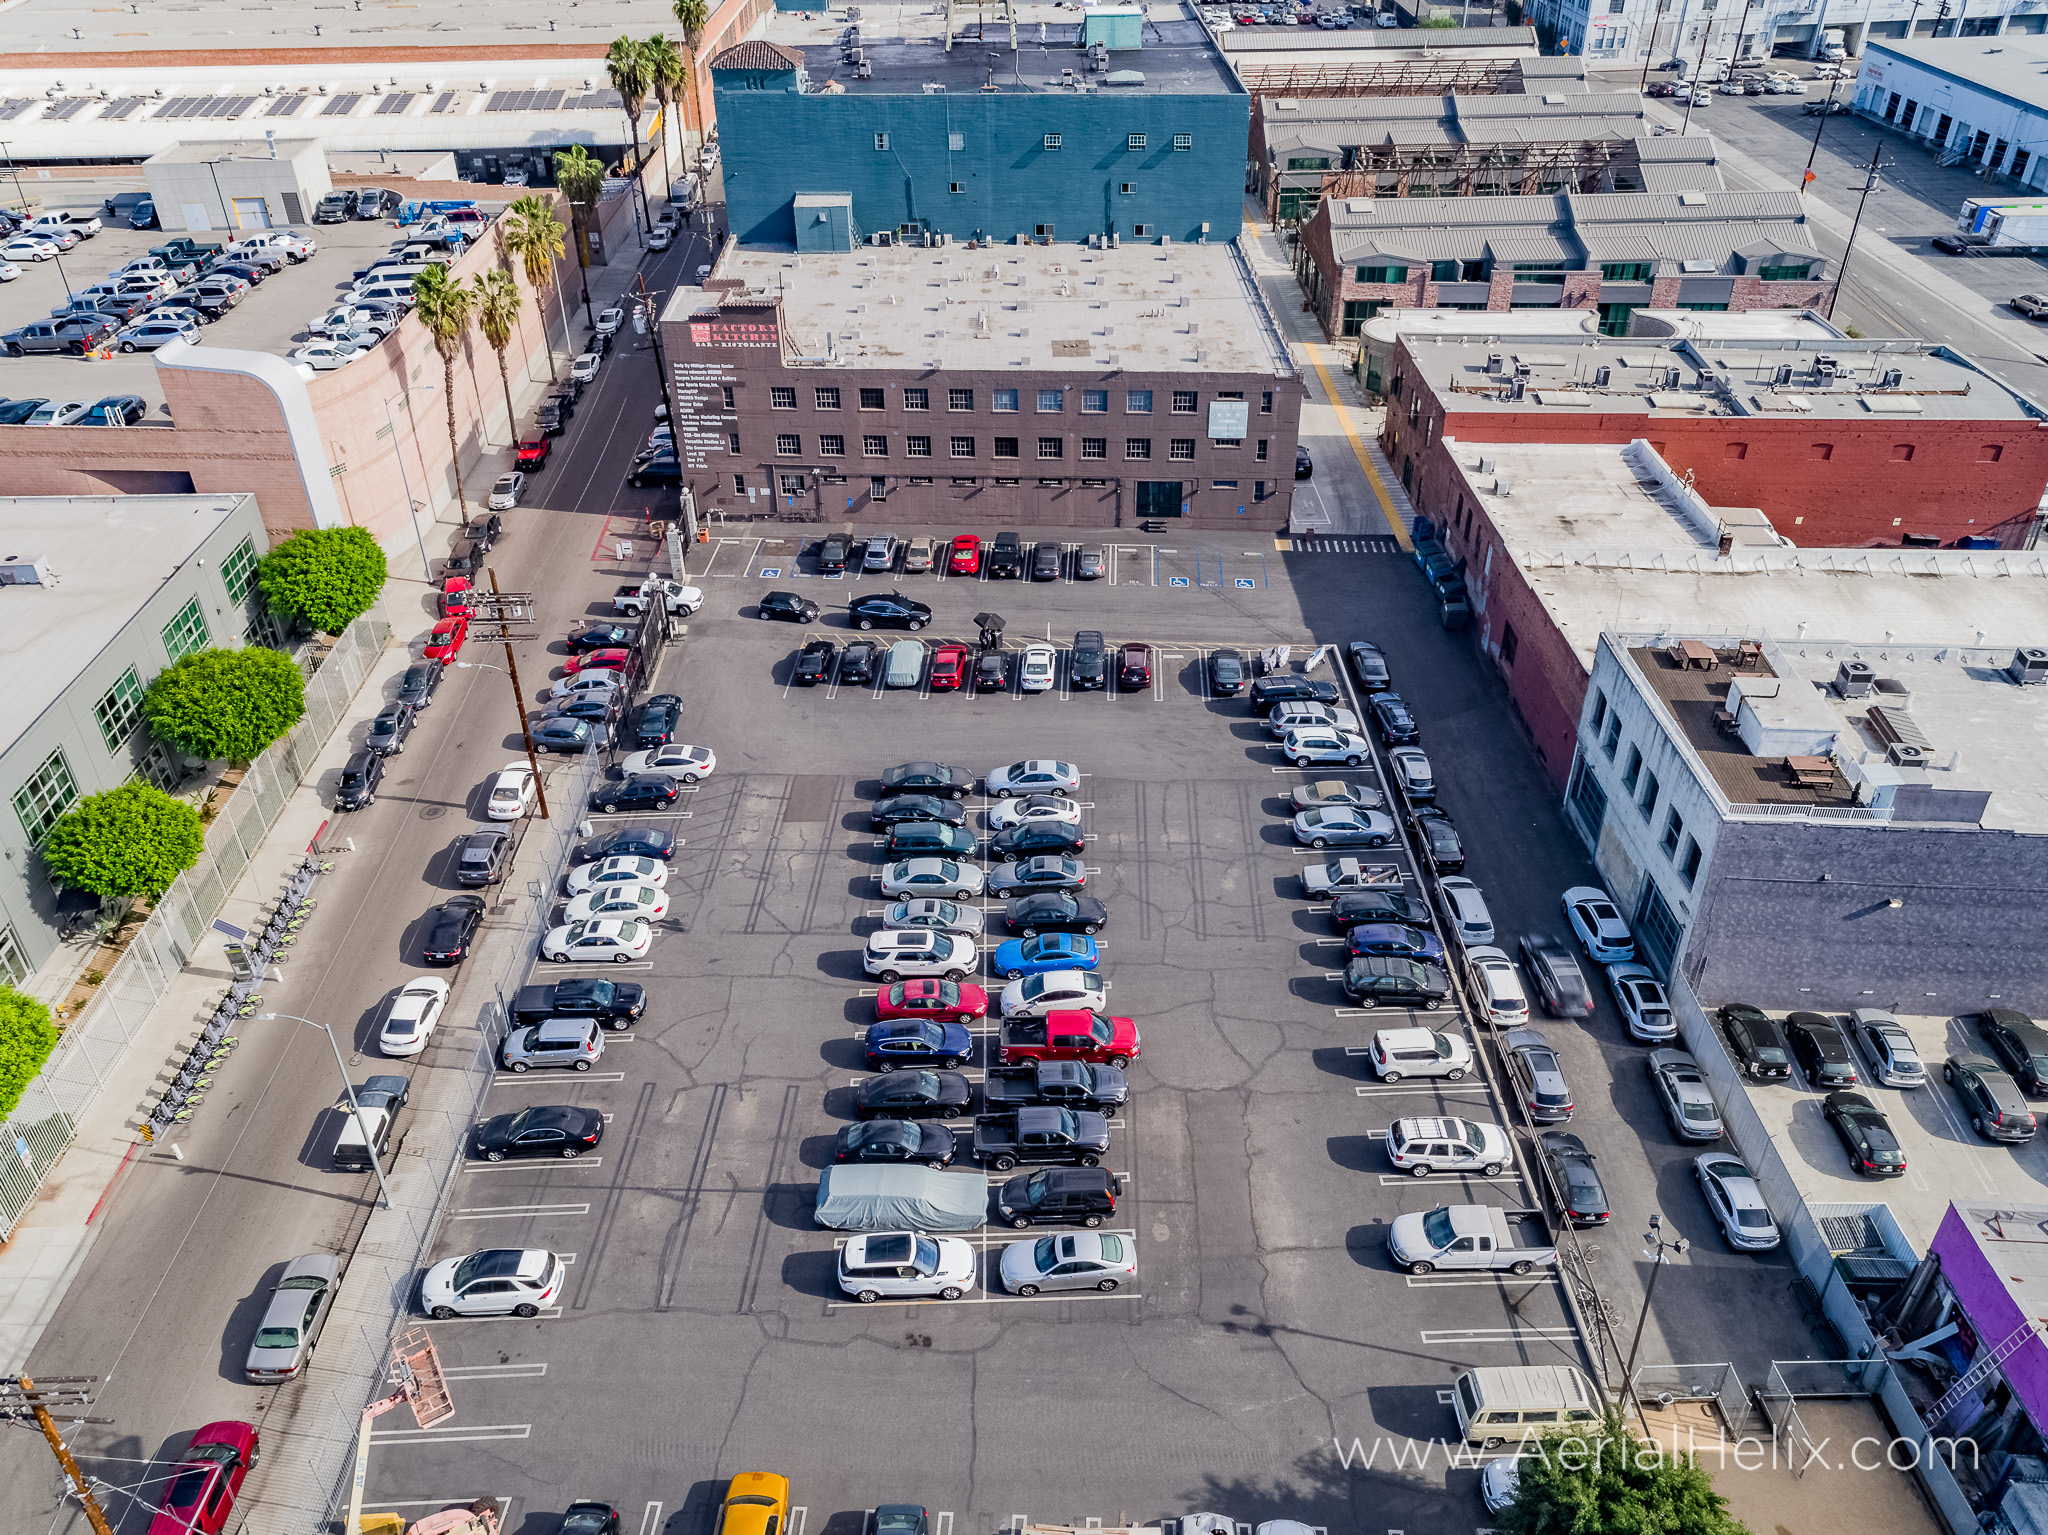 Perfect Parking 2 aerial photographer-40.jpg